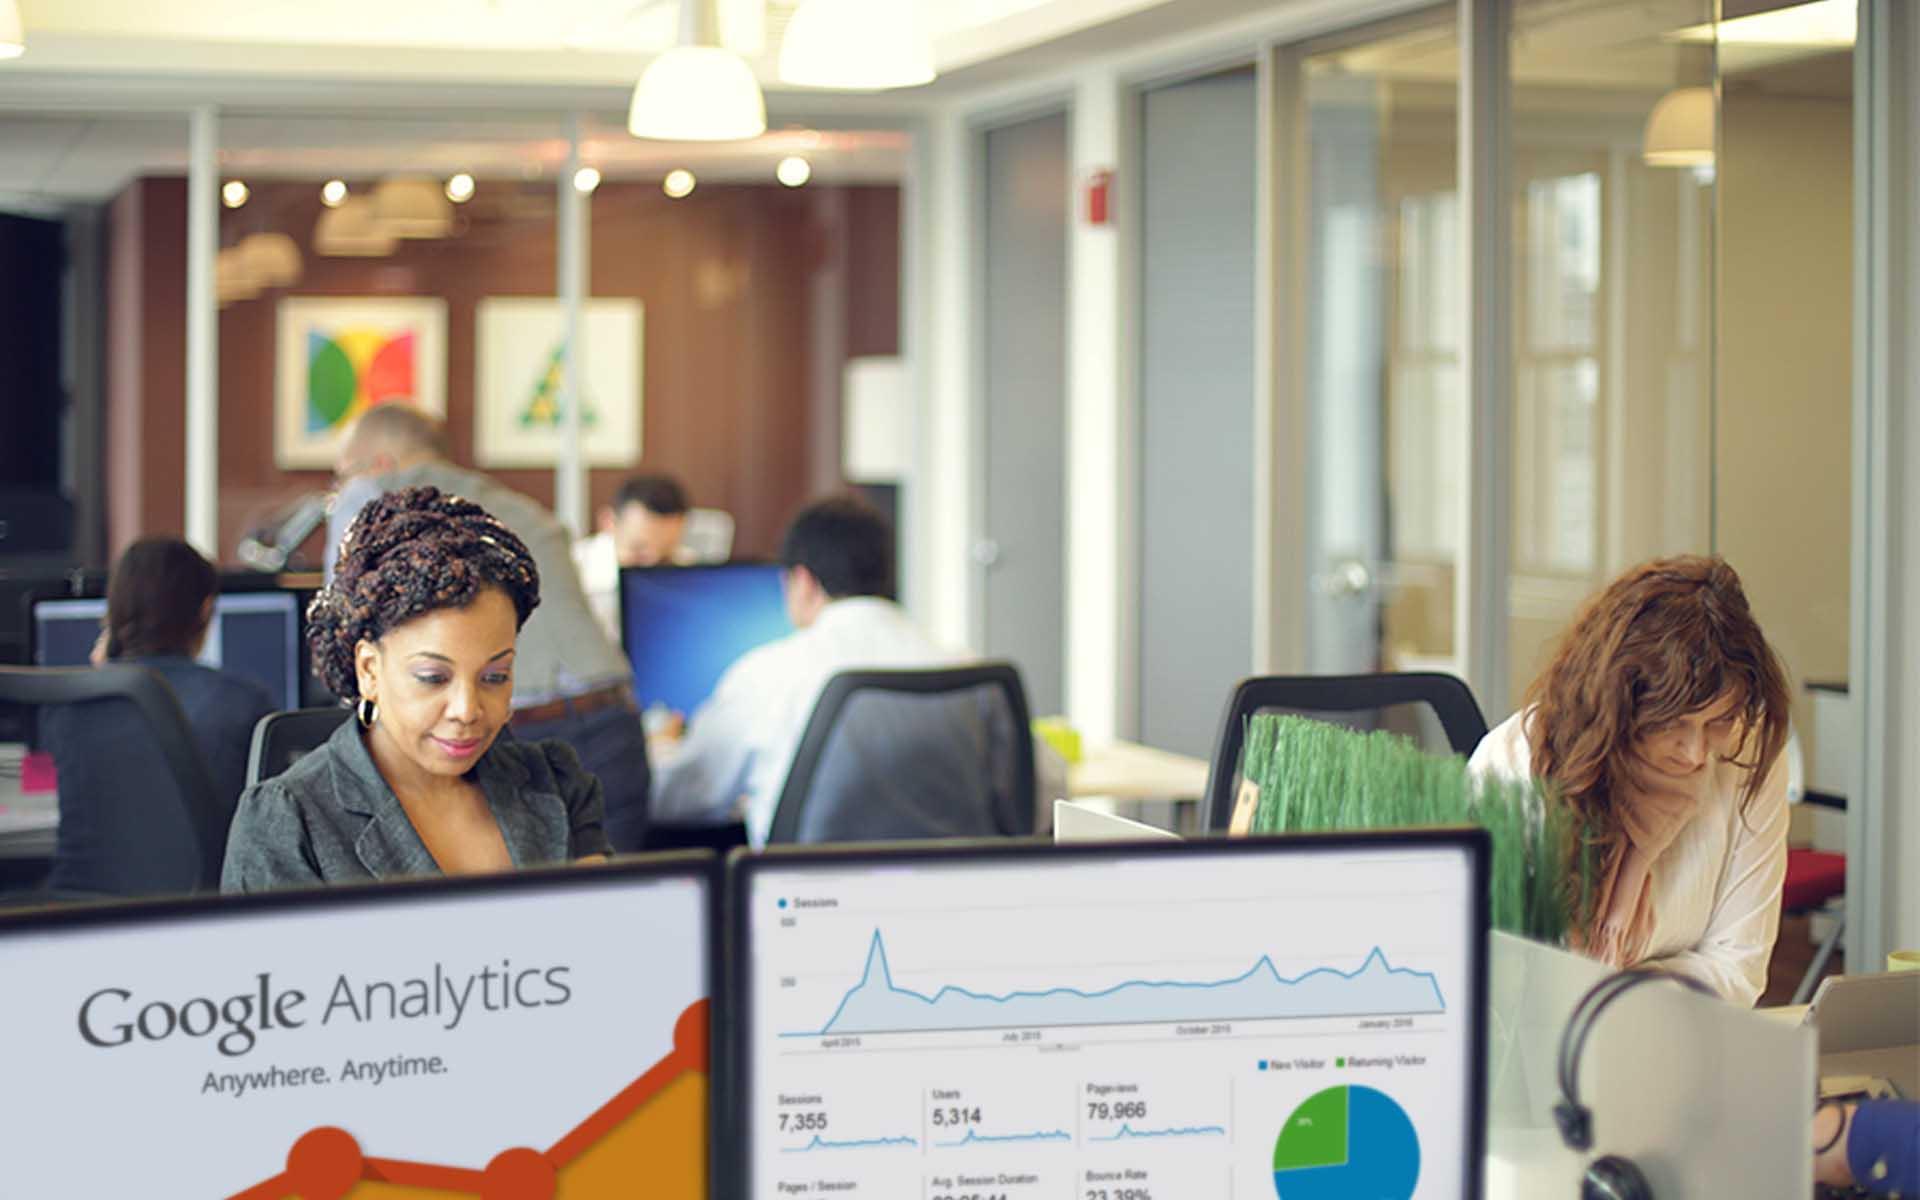 How to Use Google Analytics: Best Metrics & Reports